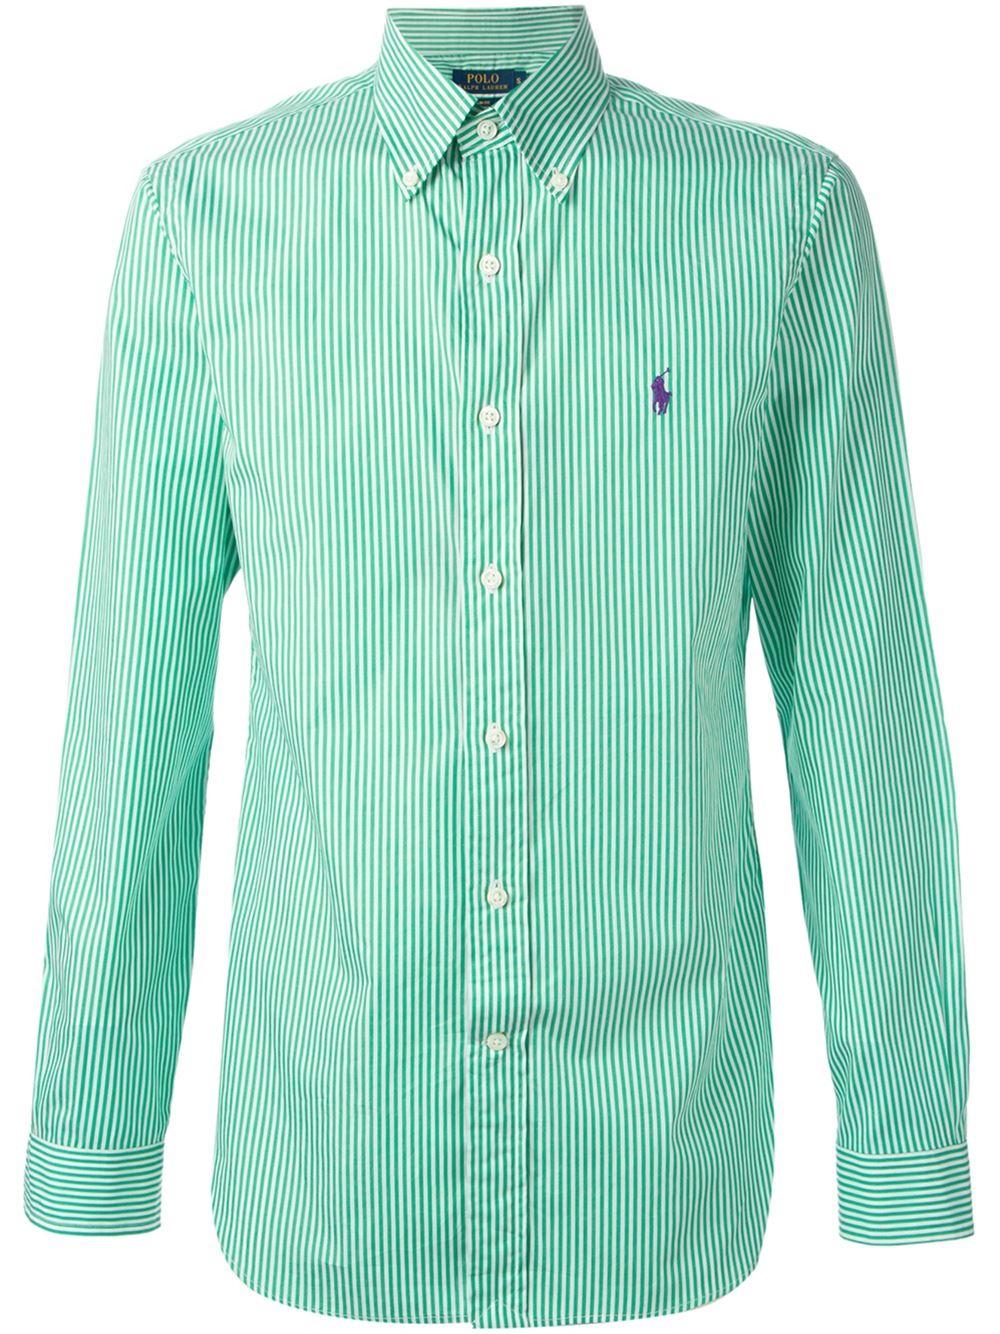 polo ralph lauren button down shirts for men .